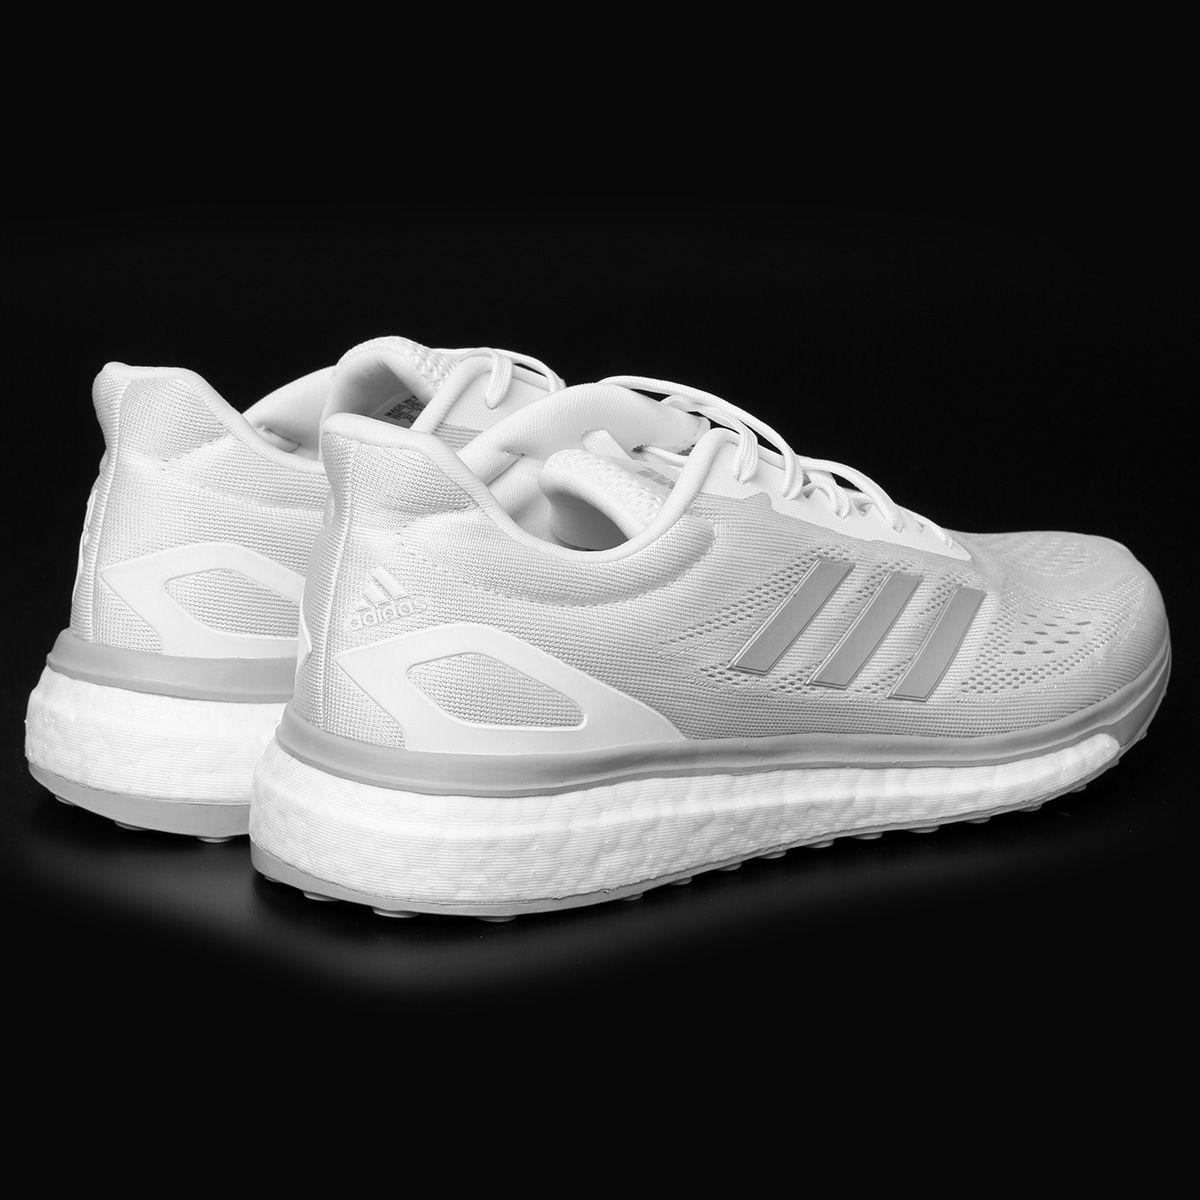 Tênis adidas Response Boost Lt Feminino - Branco Promoção - R  269 ... 245ba5ae2b683